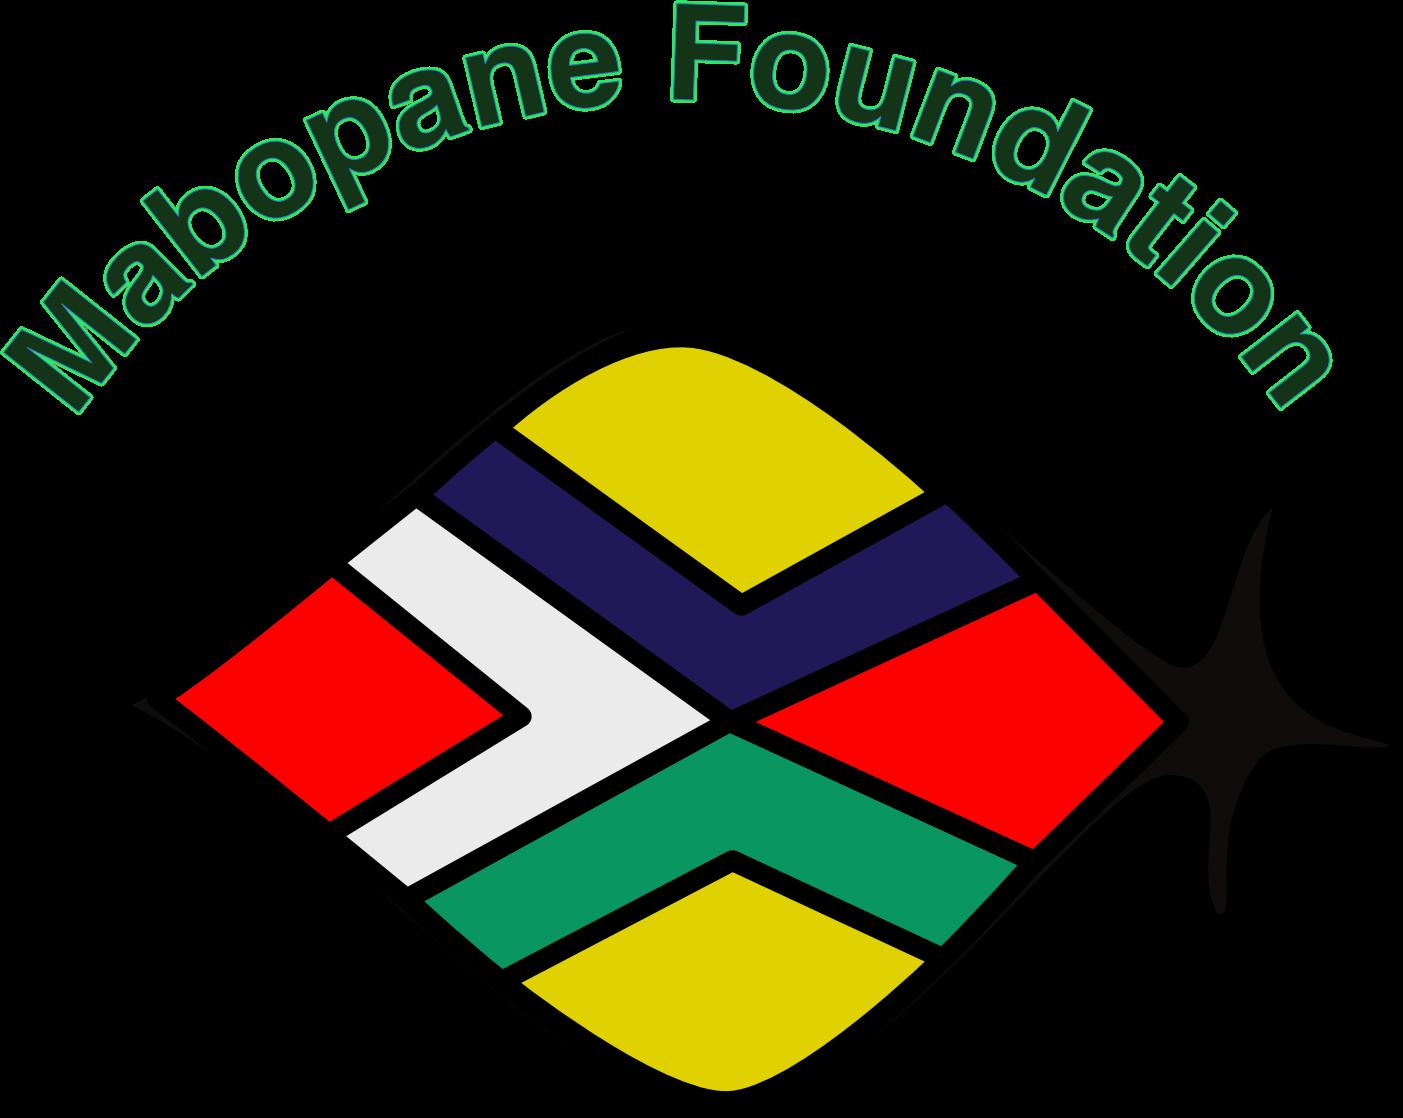 Mabopane logo